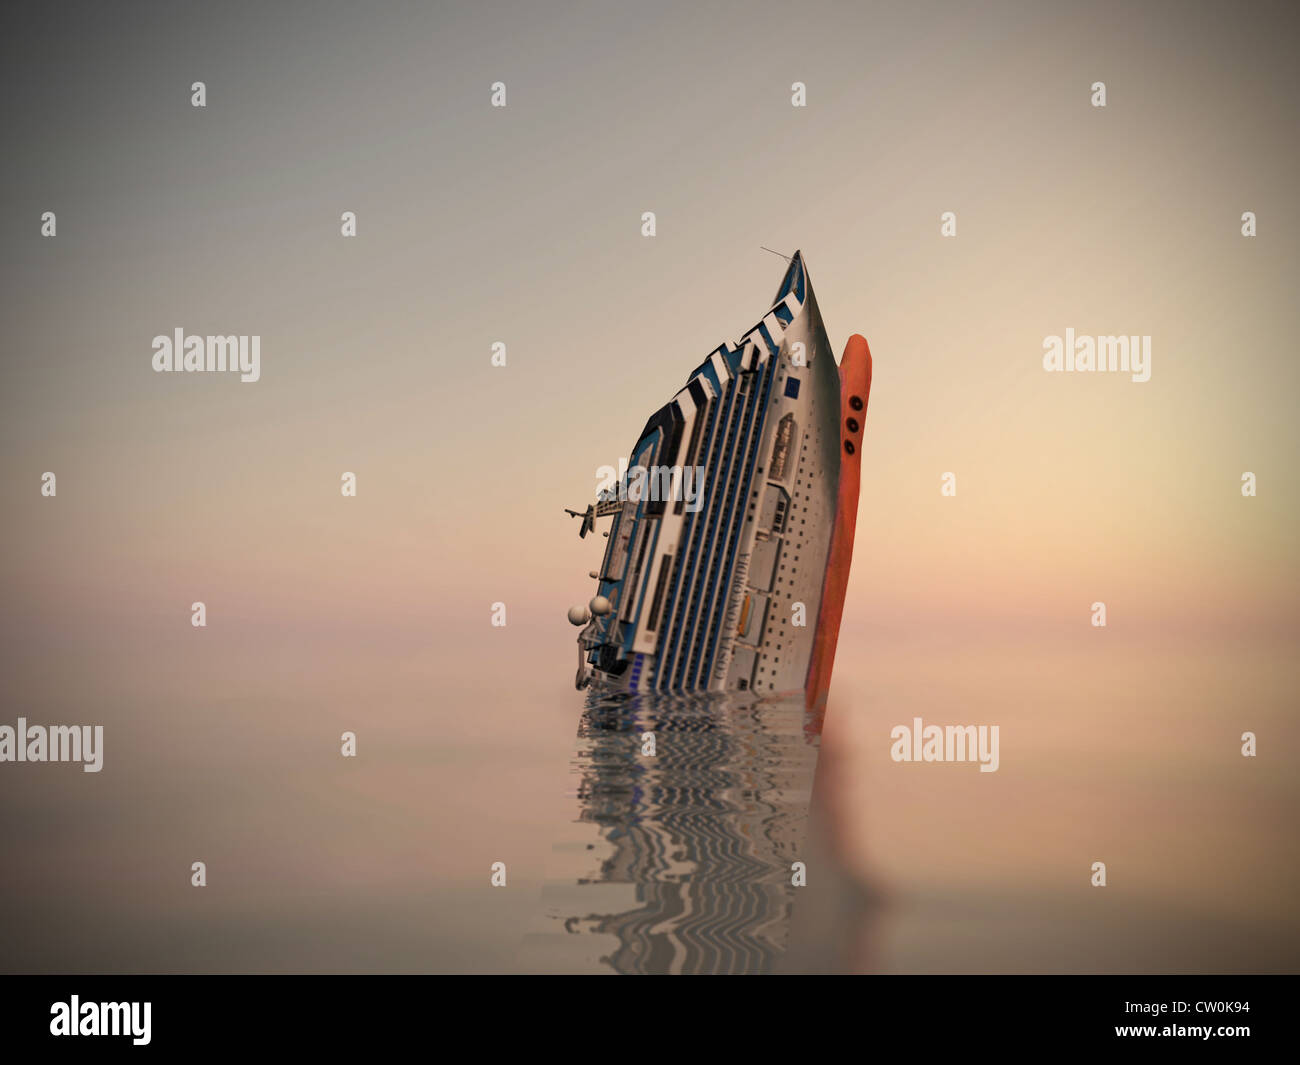 Cruise Ship Sinking In The Sea Stock Photo